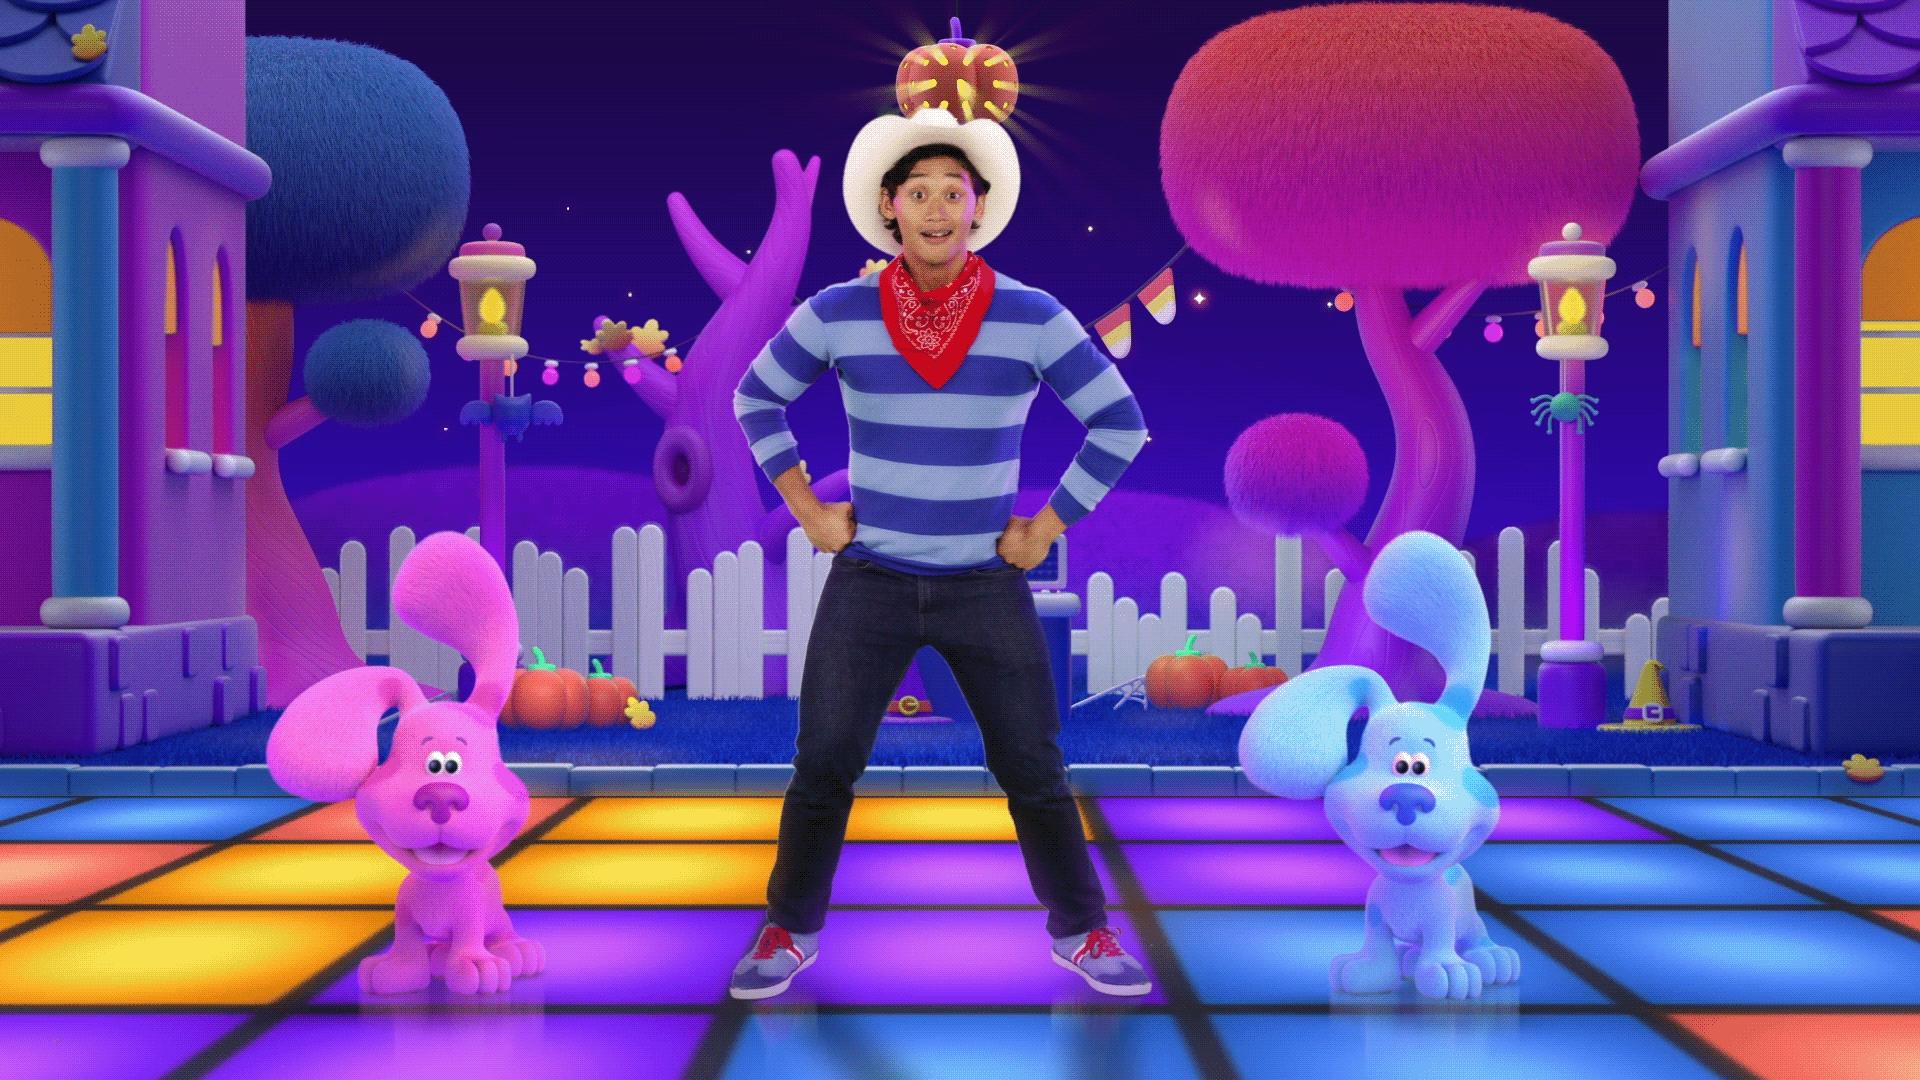 Halloween 2020 Nick Nick Jr. Halloween 2019 Campaign on Behance in 2020 | Nick jr